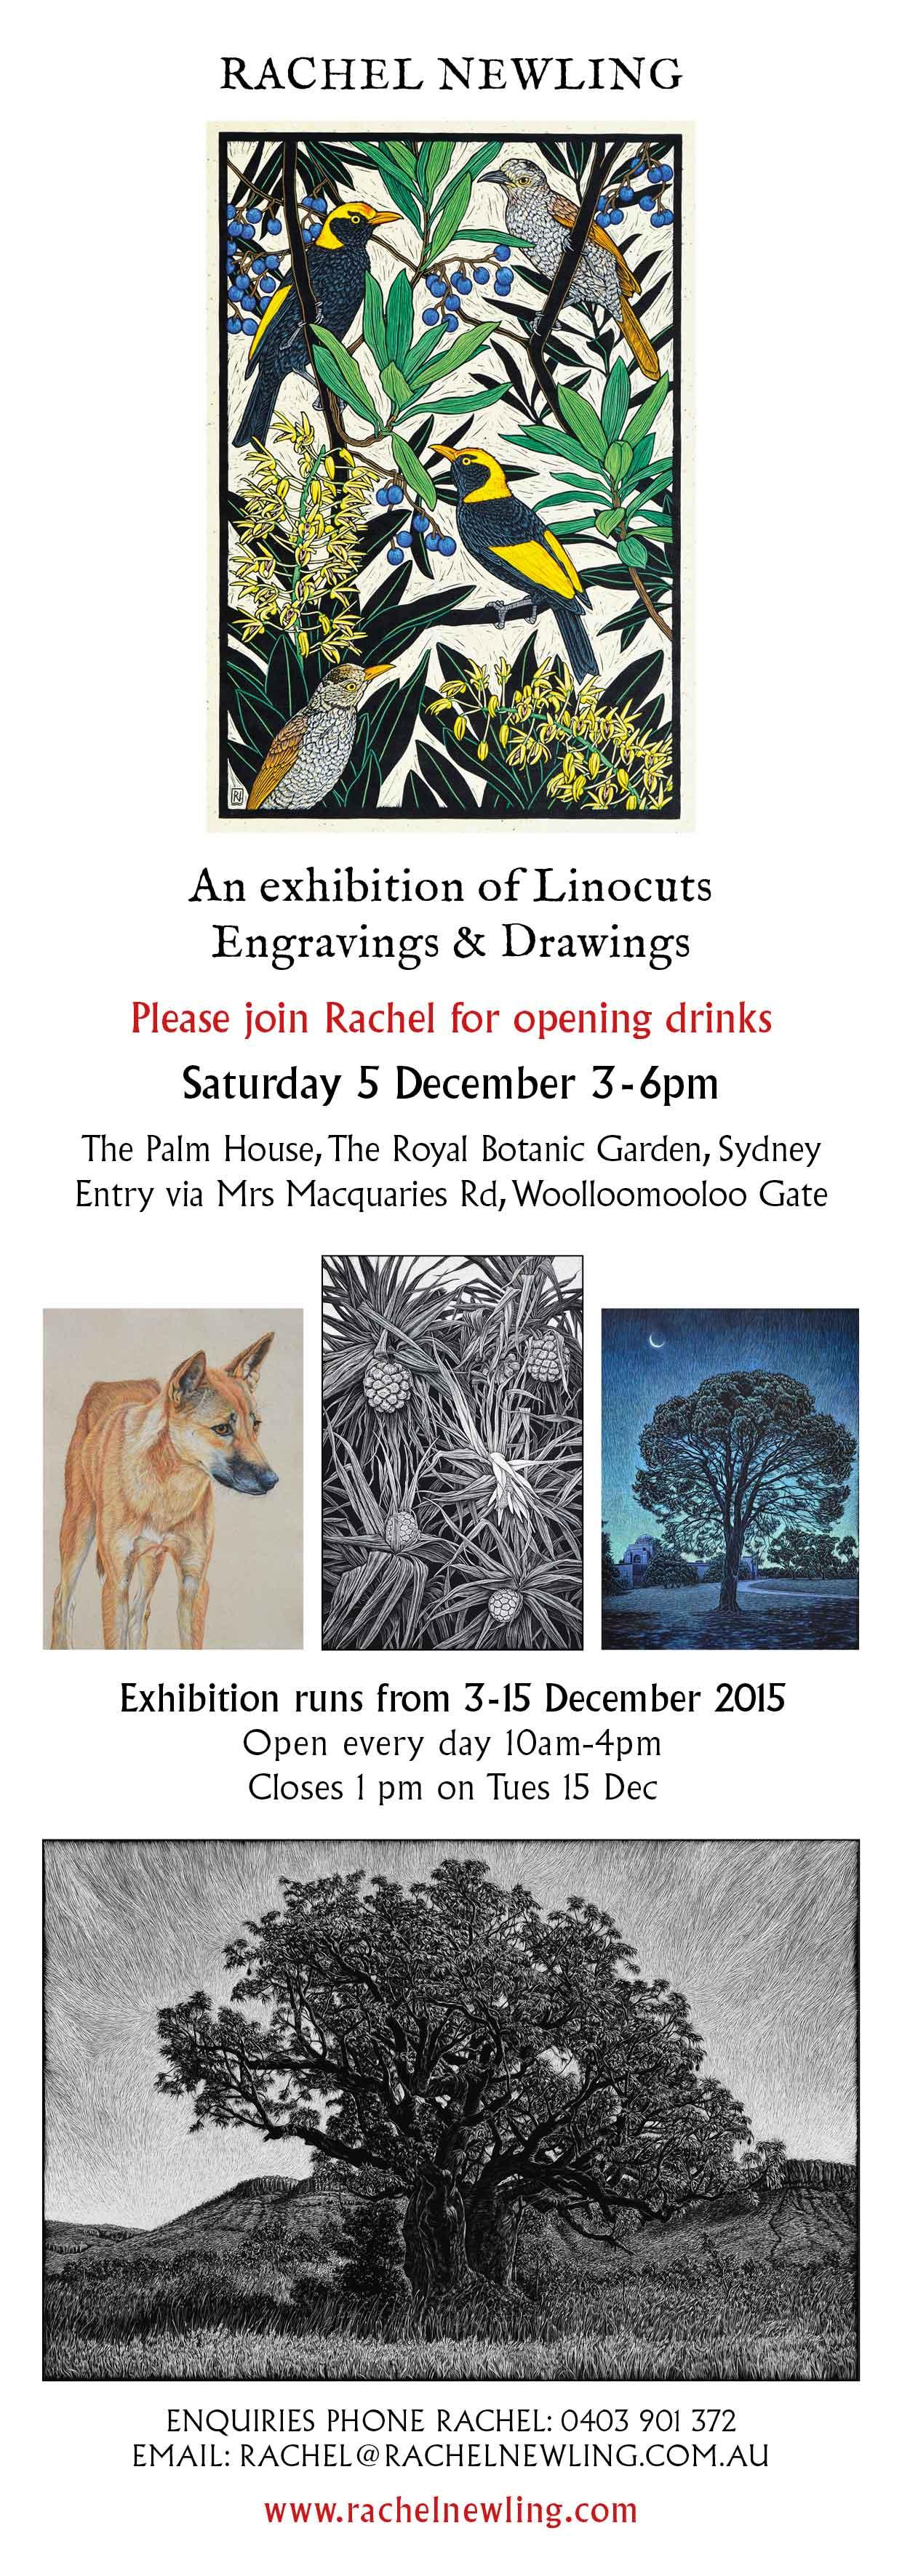 exhibition-invitation-rachel-newling.jpg